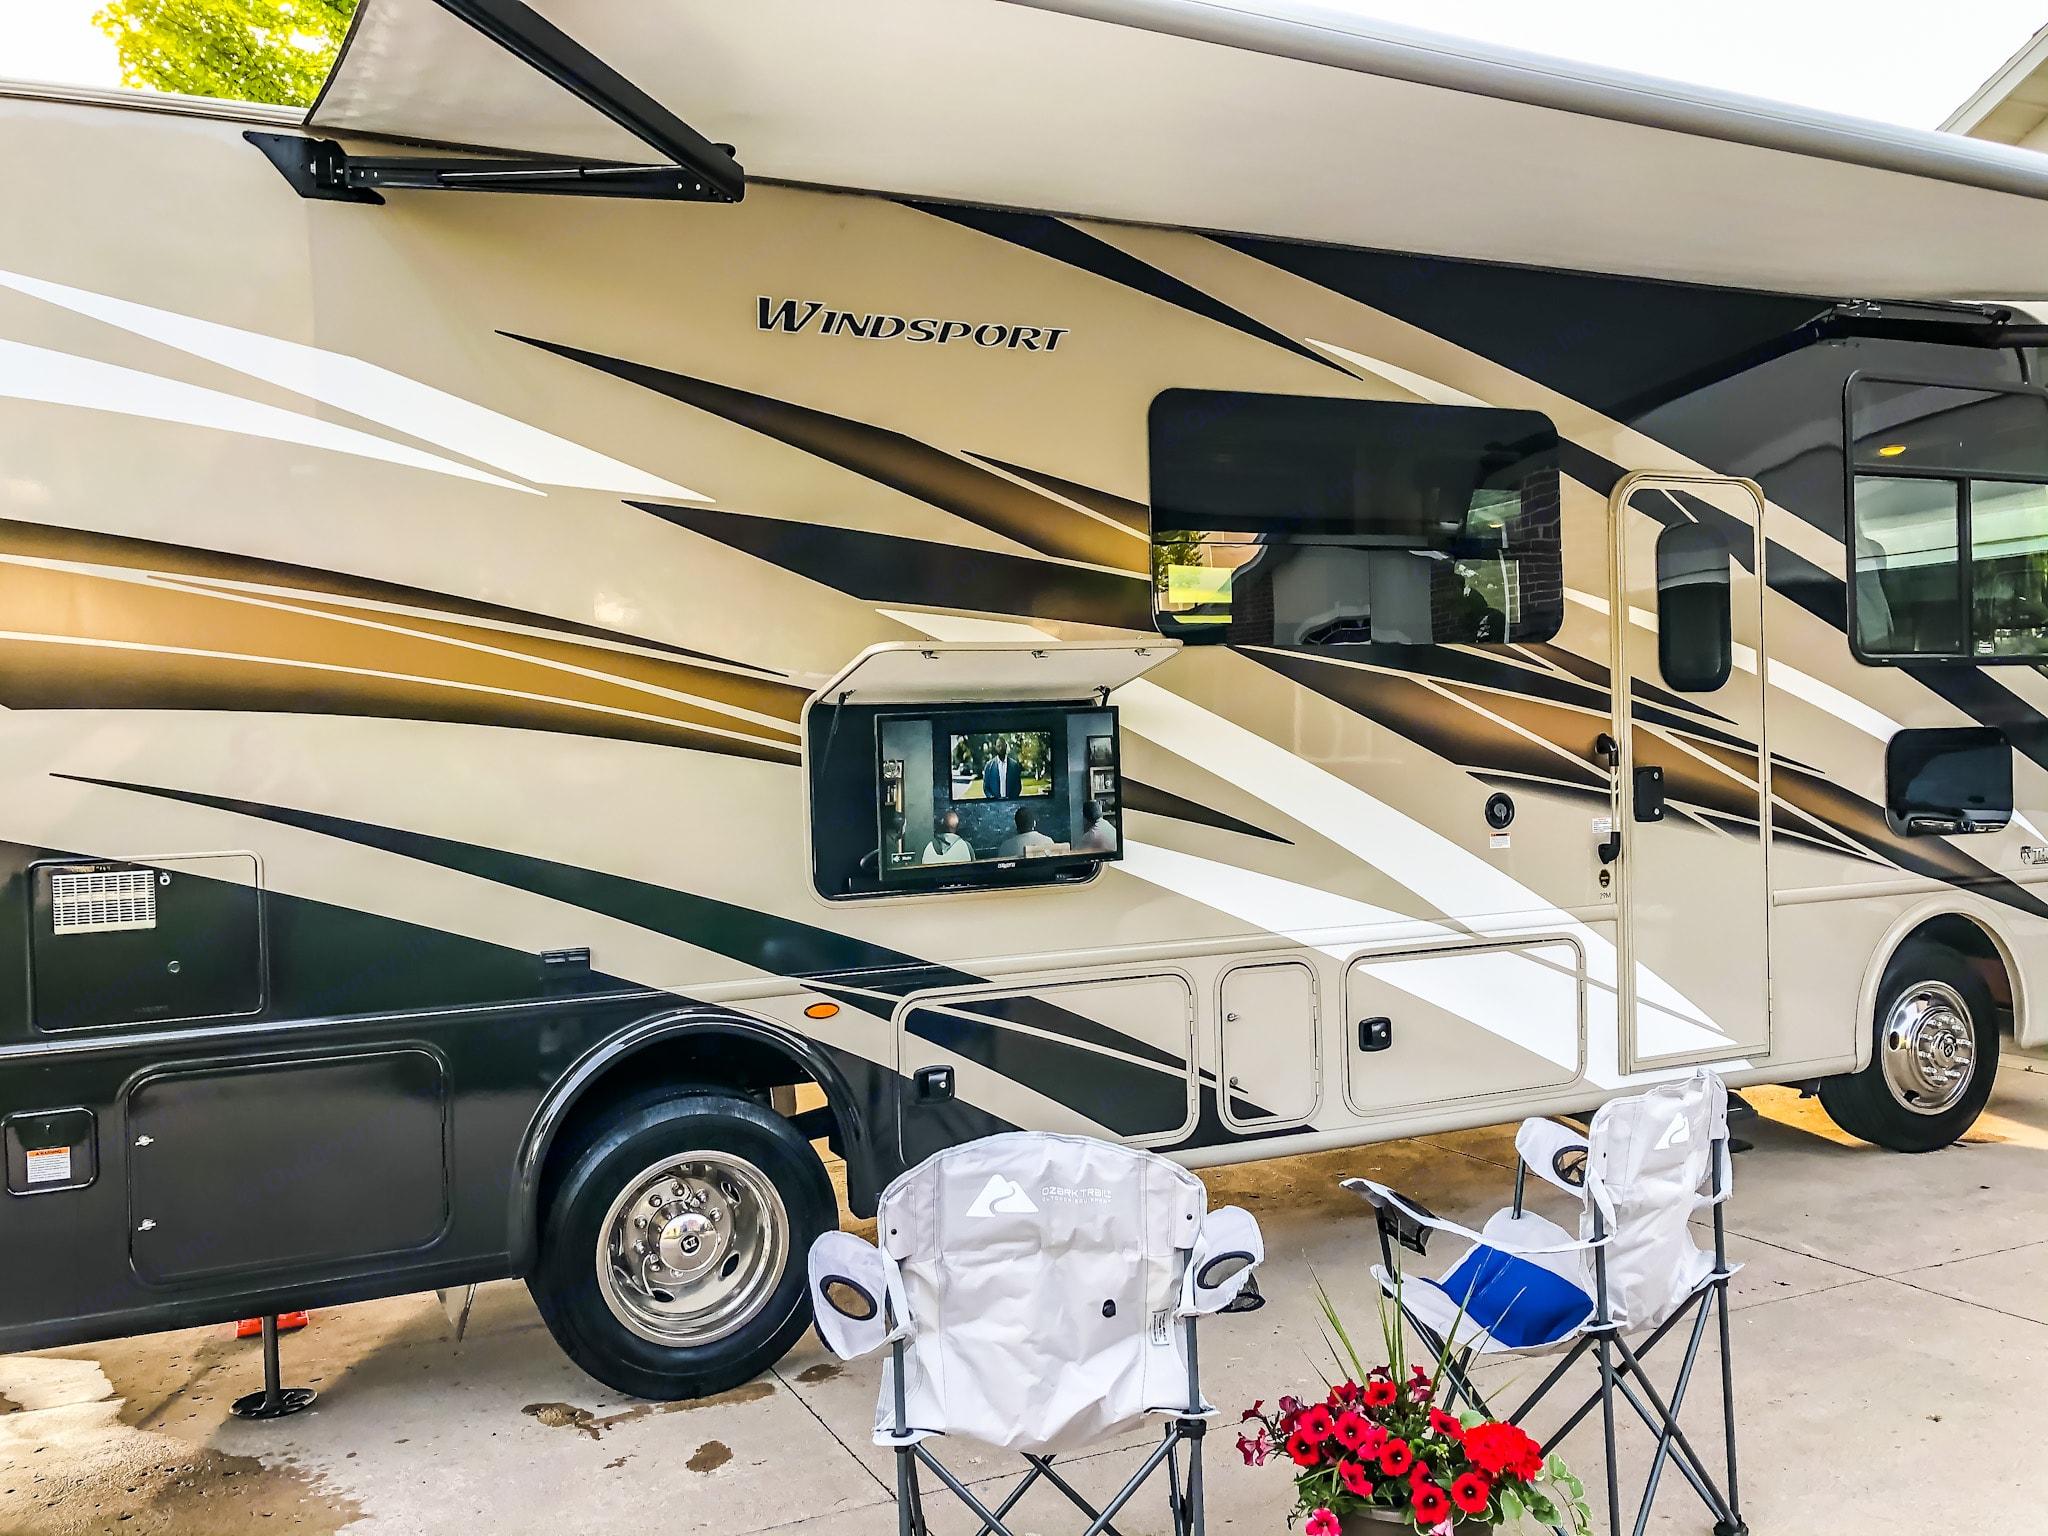 Outdoor TV with Sound Bar. Thor Motor Coach Windsport 29M 2020